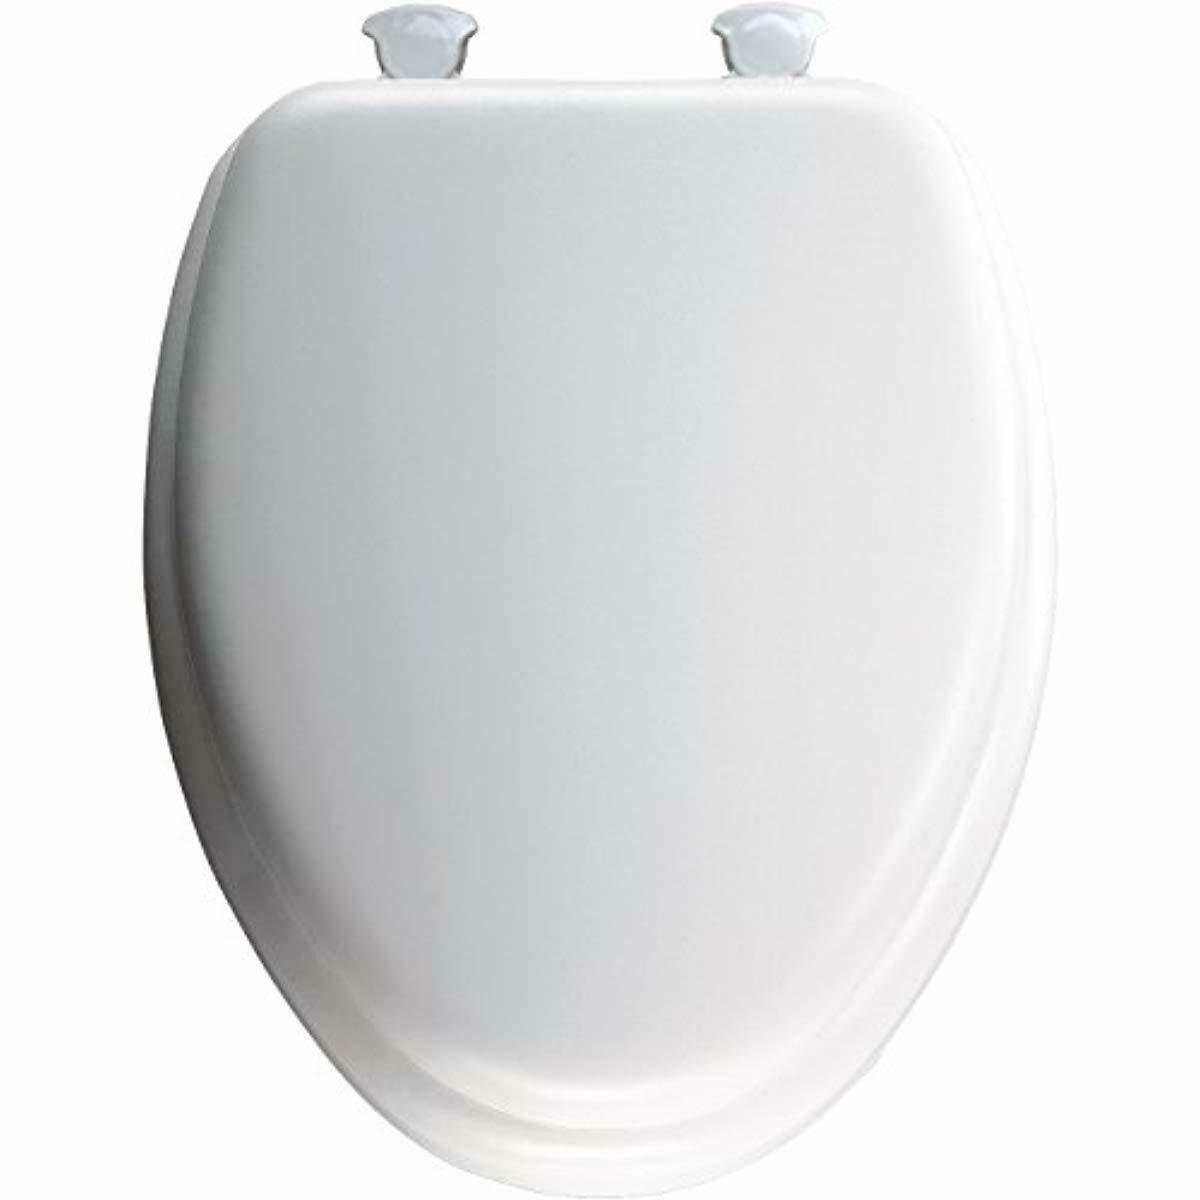 Premium Toilet Padded Seat Standard